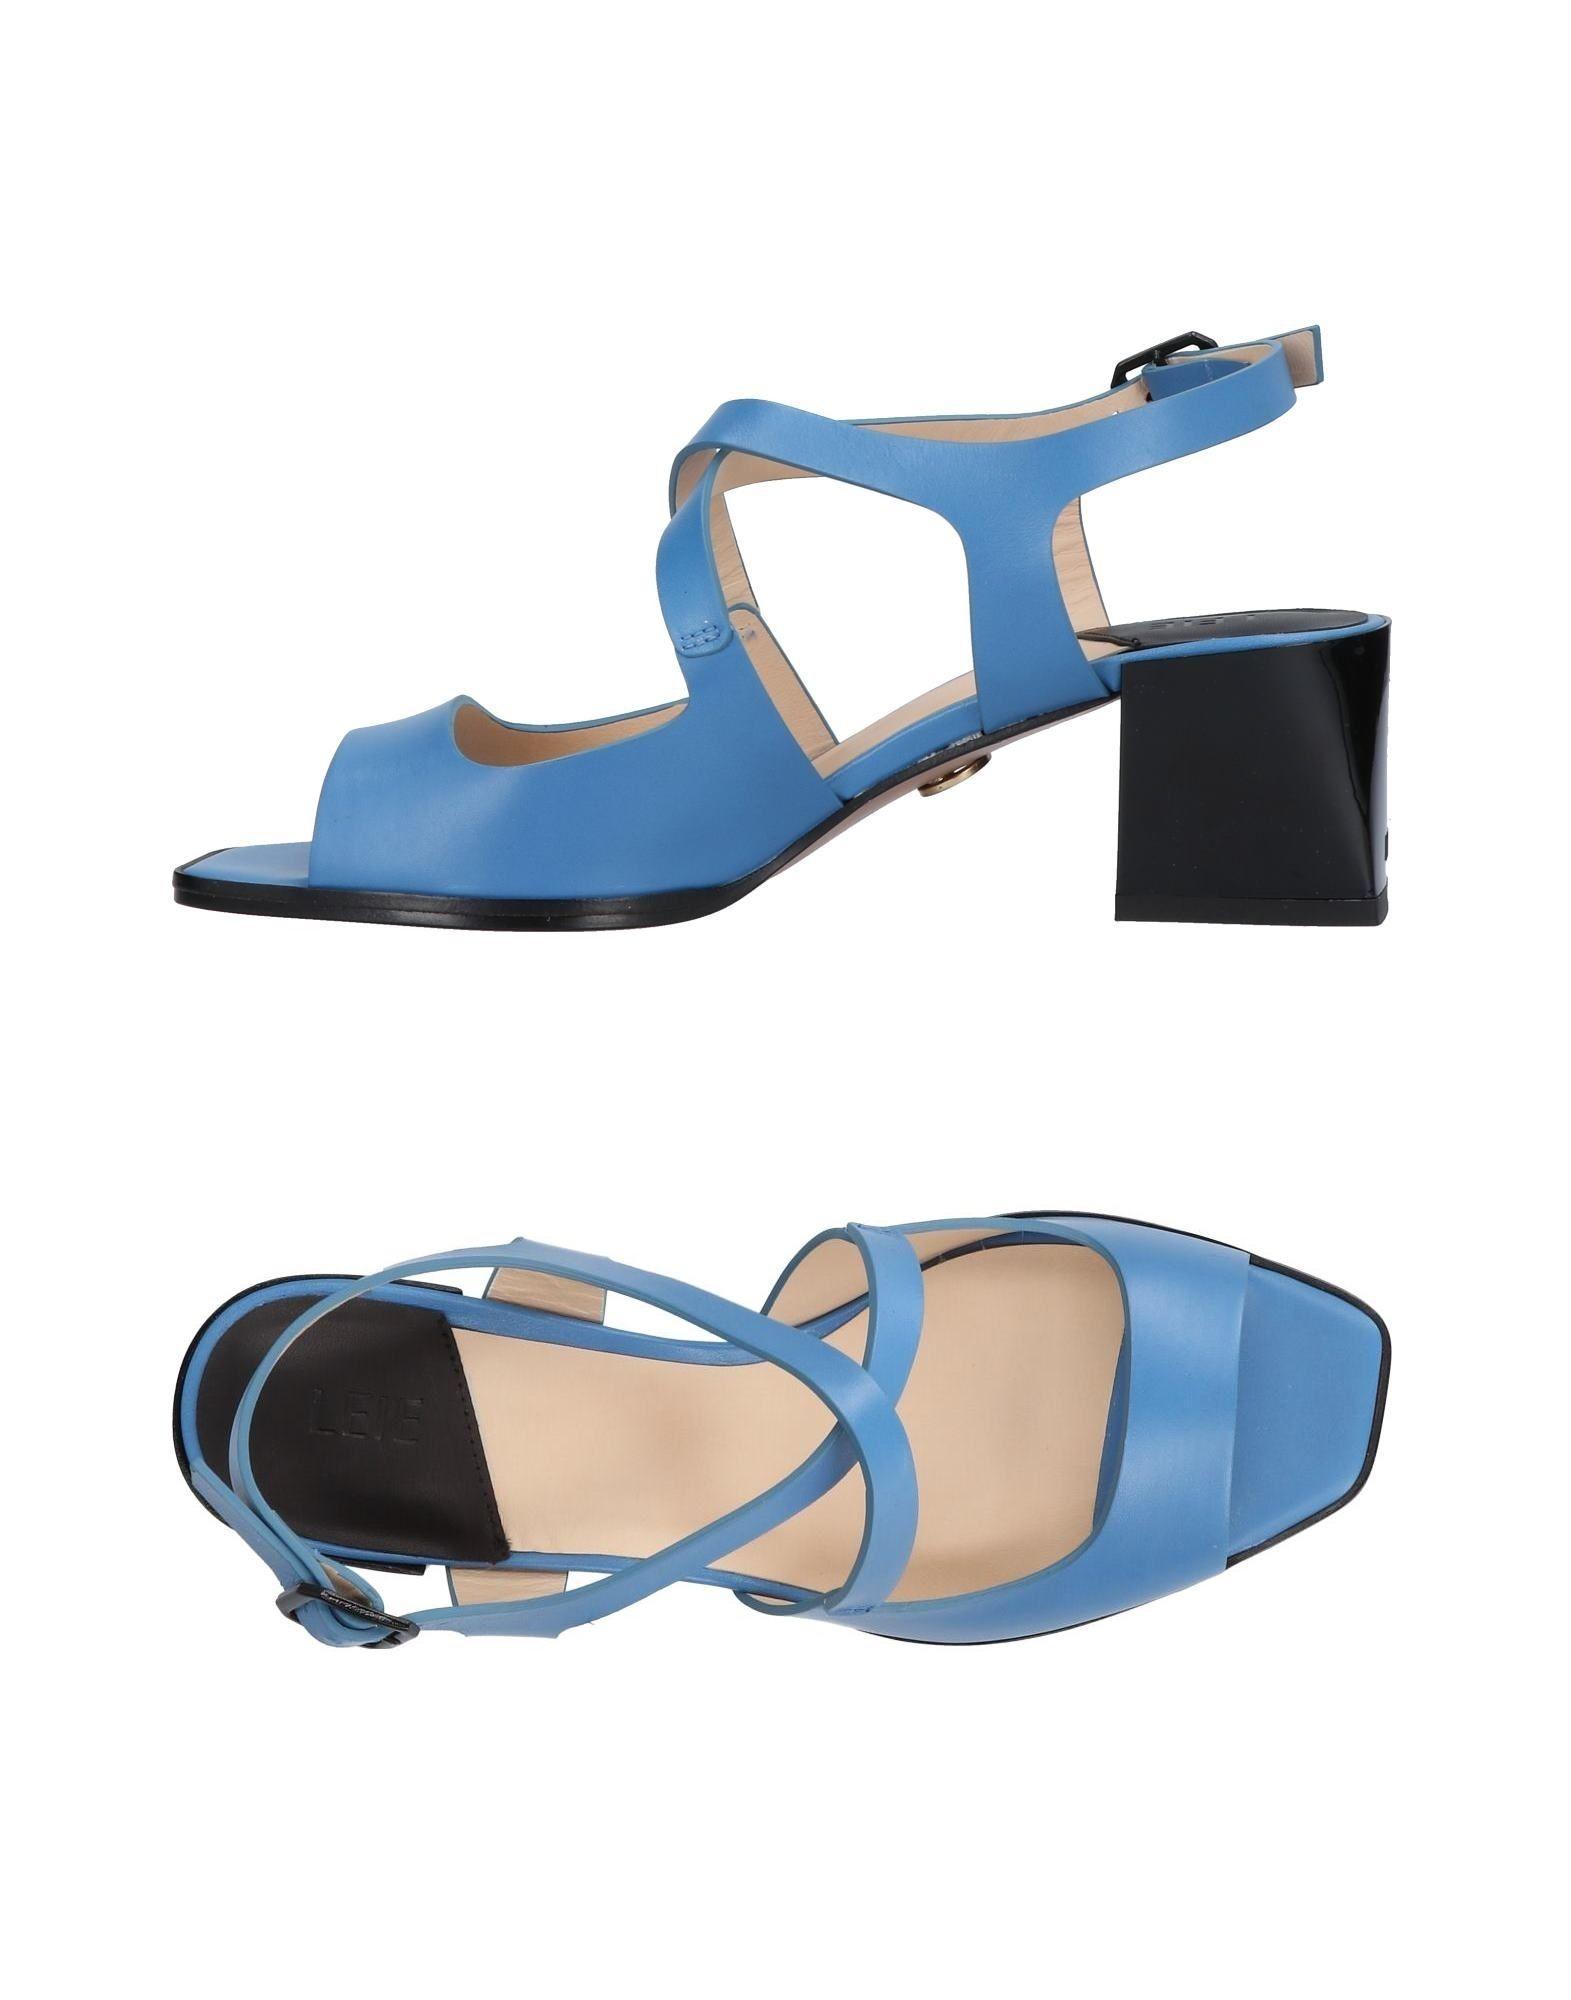 Leie Sandalen Damen  11458401XV Gute Qualität beliebte Schuhe